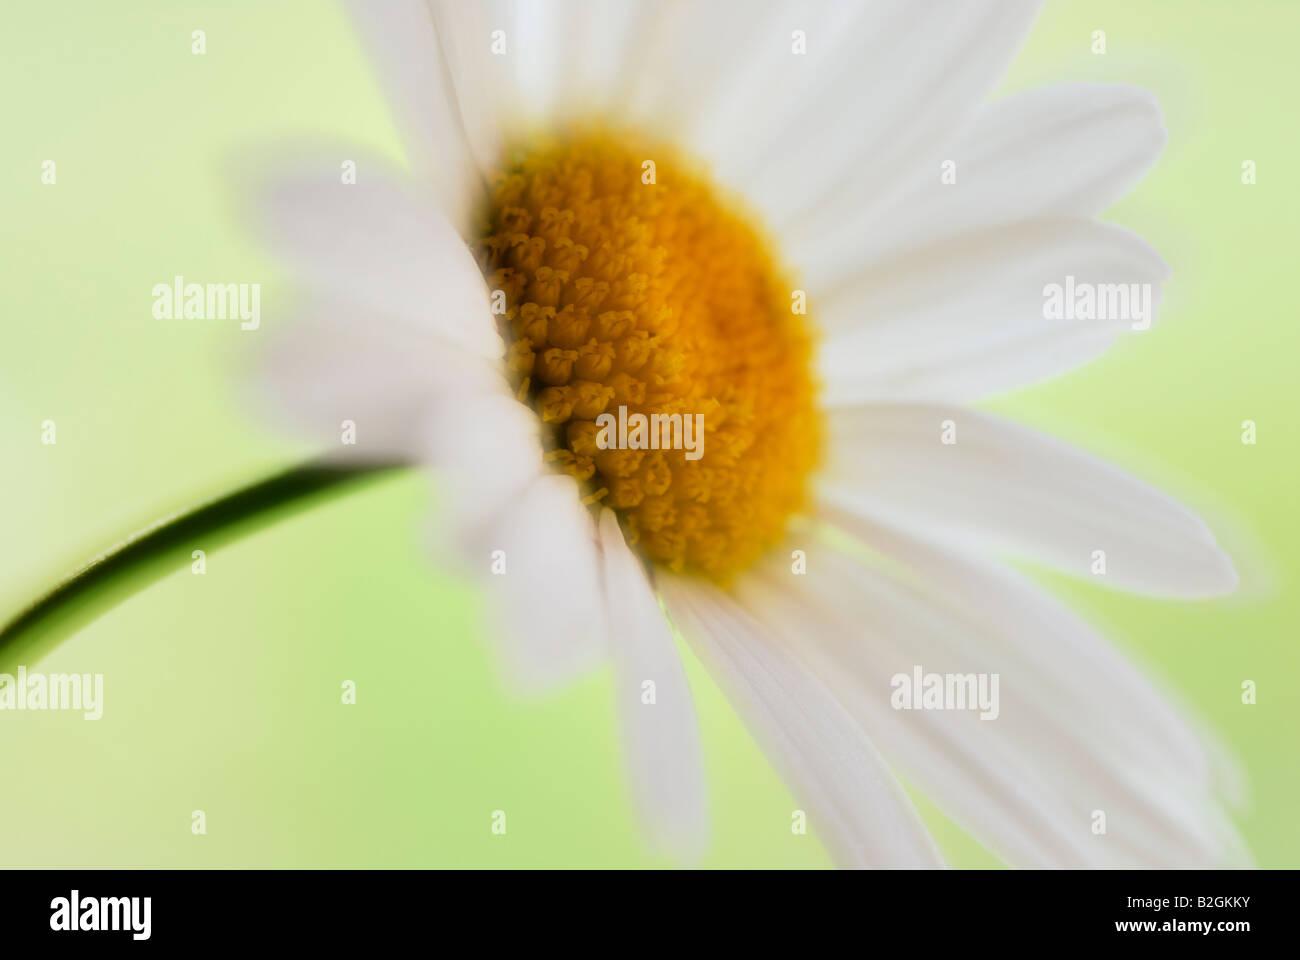 oxeye daisy Leucanthemum vulgare flowering plant bloom blossom blooming still stills background backgrounds patterns - Stock Image